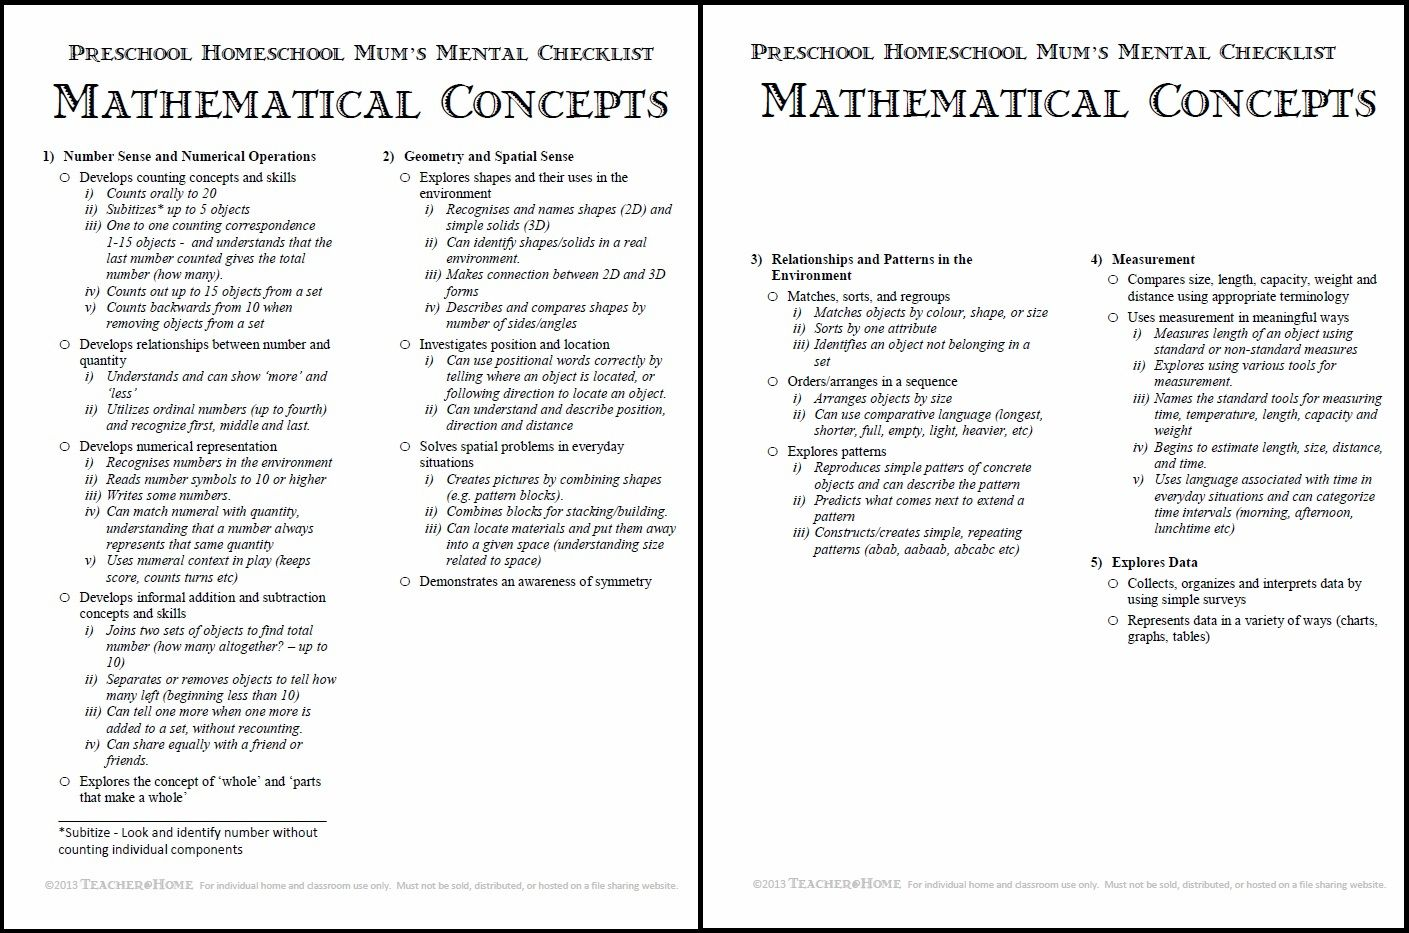 2.bp.blogspot.com --J3kgg-YSqY Ueo5xr2xHaI AAAAAAAAA7I RWilsrTtBxo s1600 Mathematical+Concepts+pdf+Download+-+Teacher+At+Home619150664.jpg